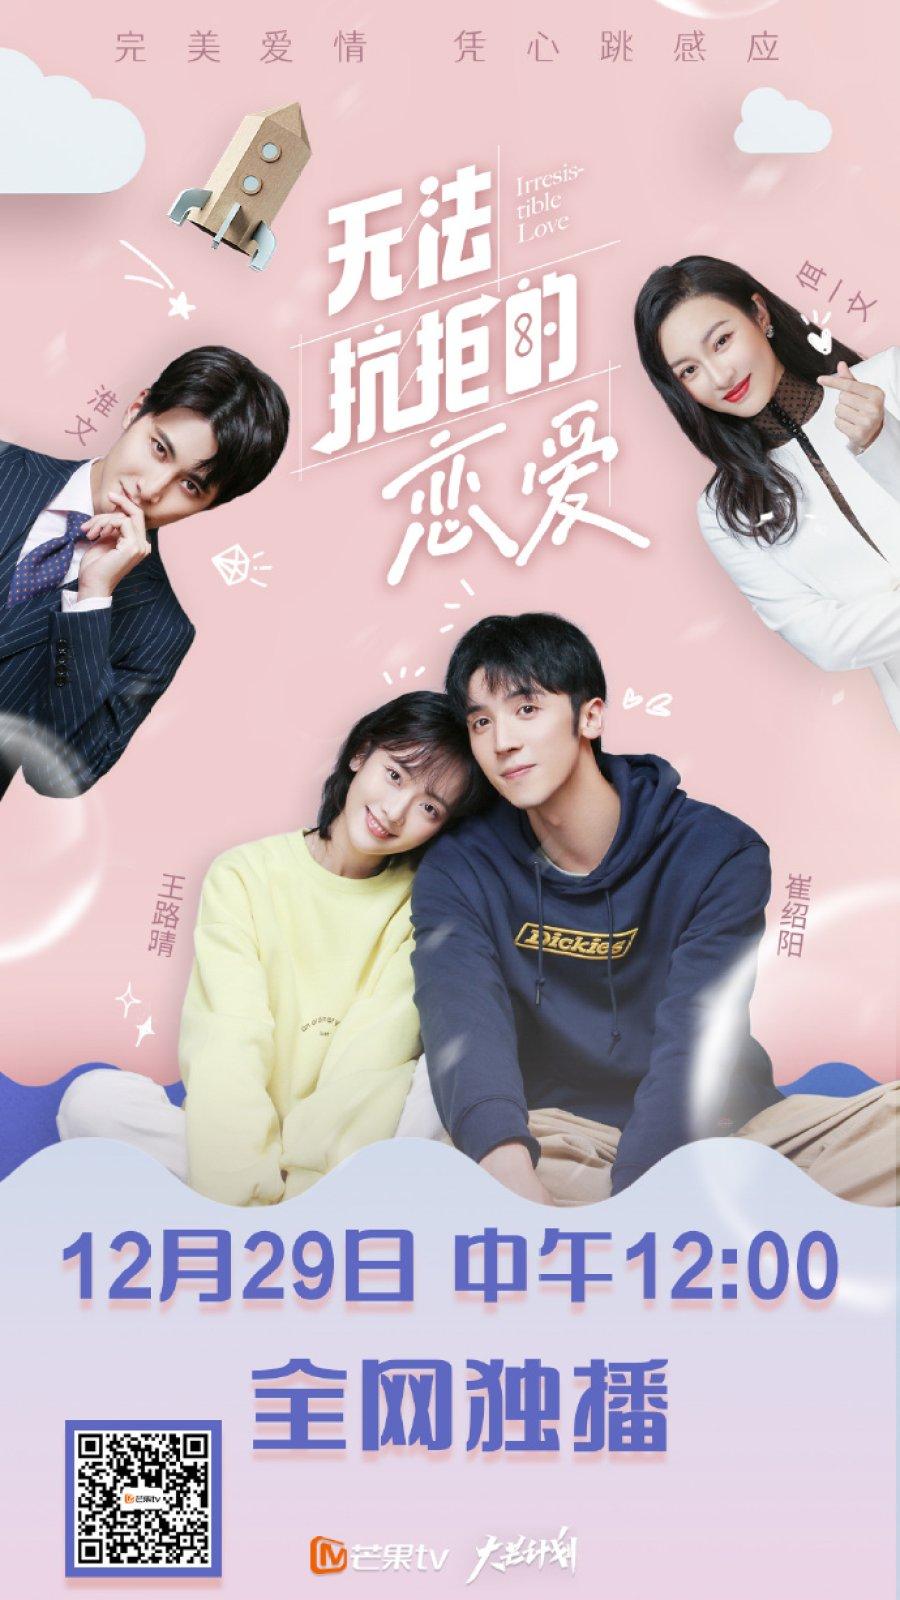 Z2mjY 4f - Непреодолимая любовь ✦ 2021 ✦ Китай